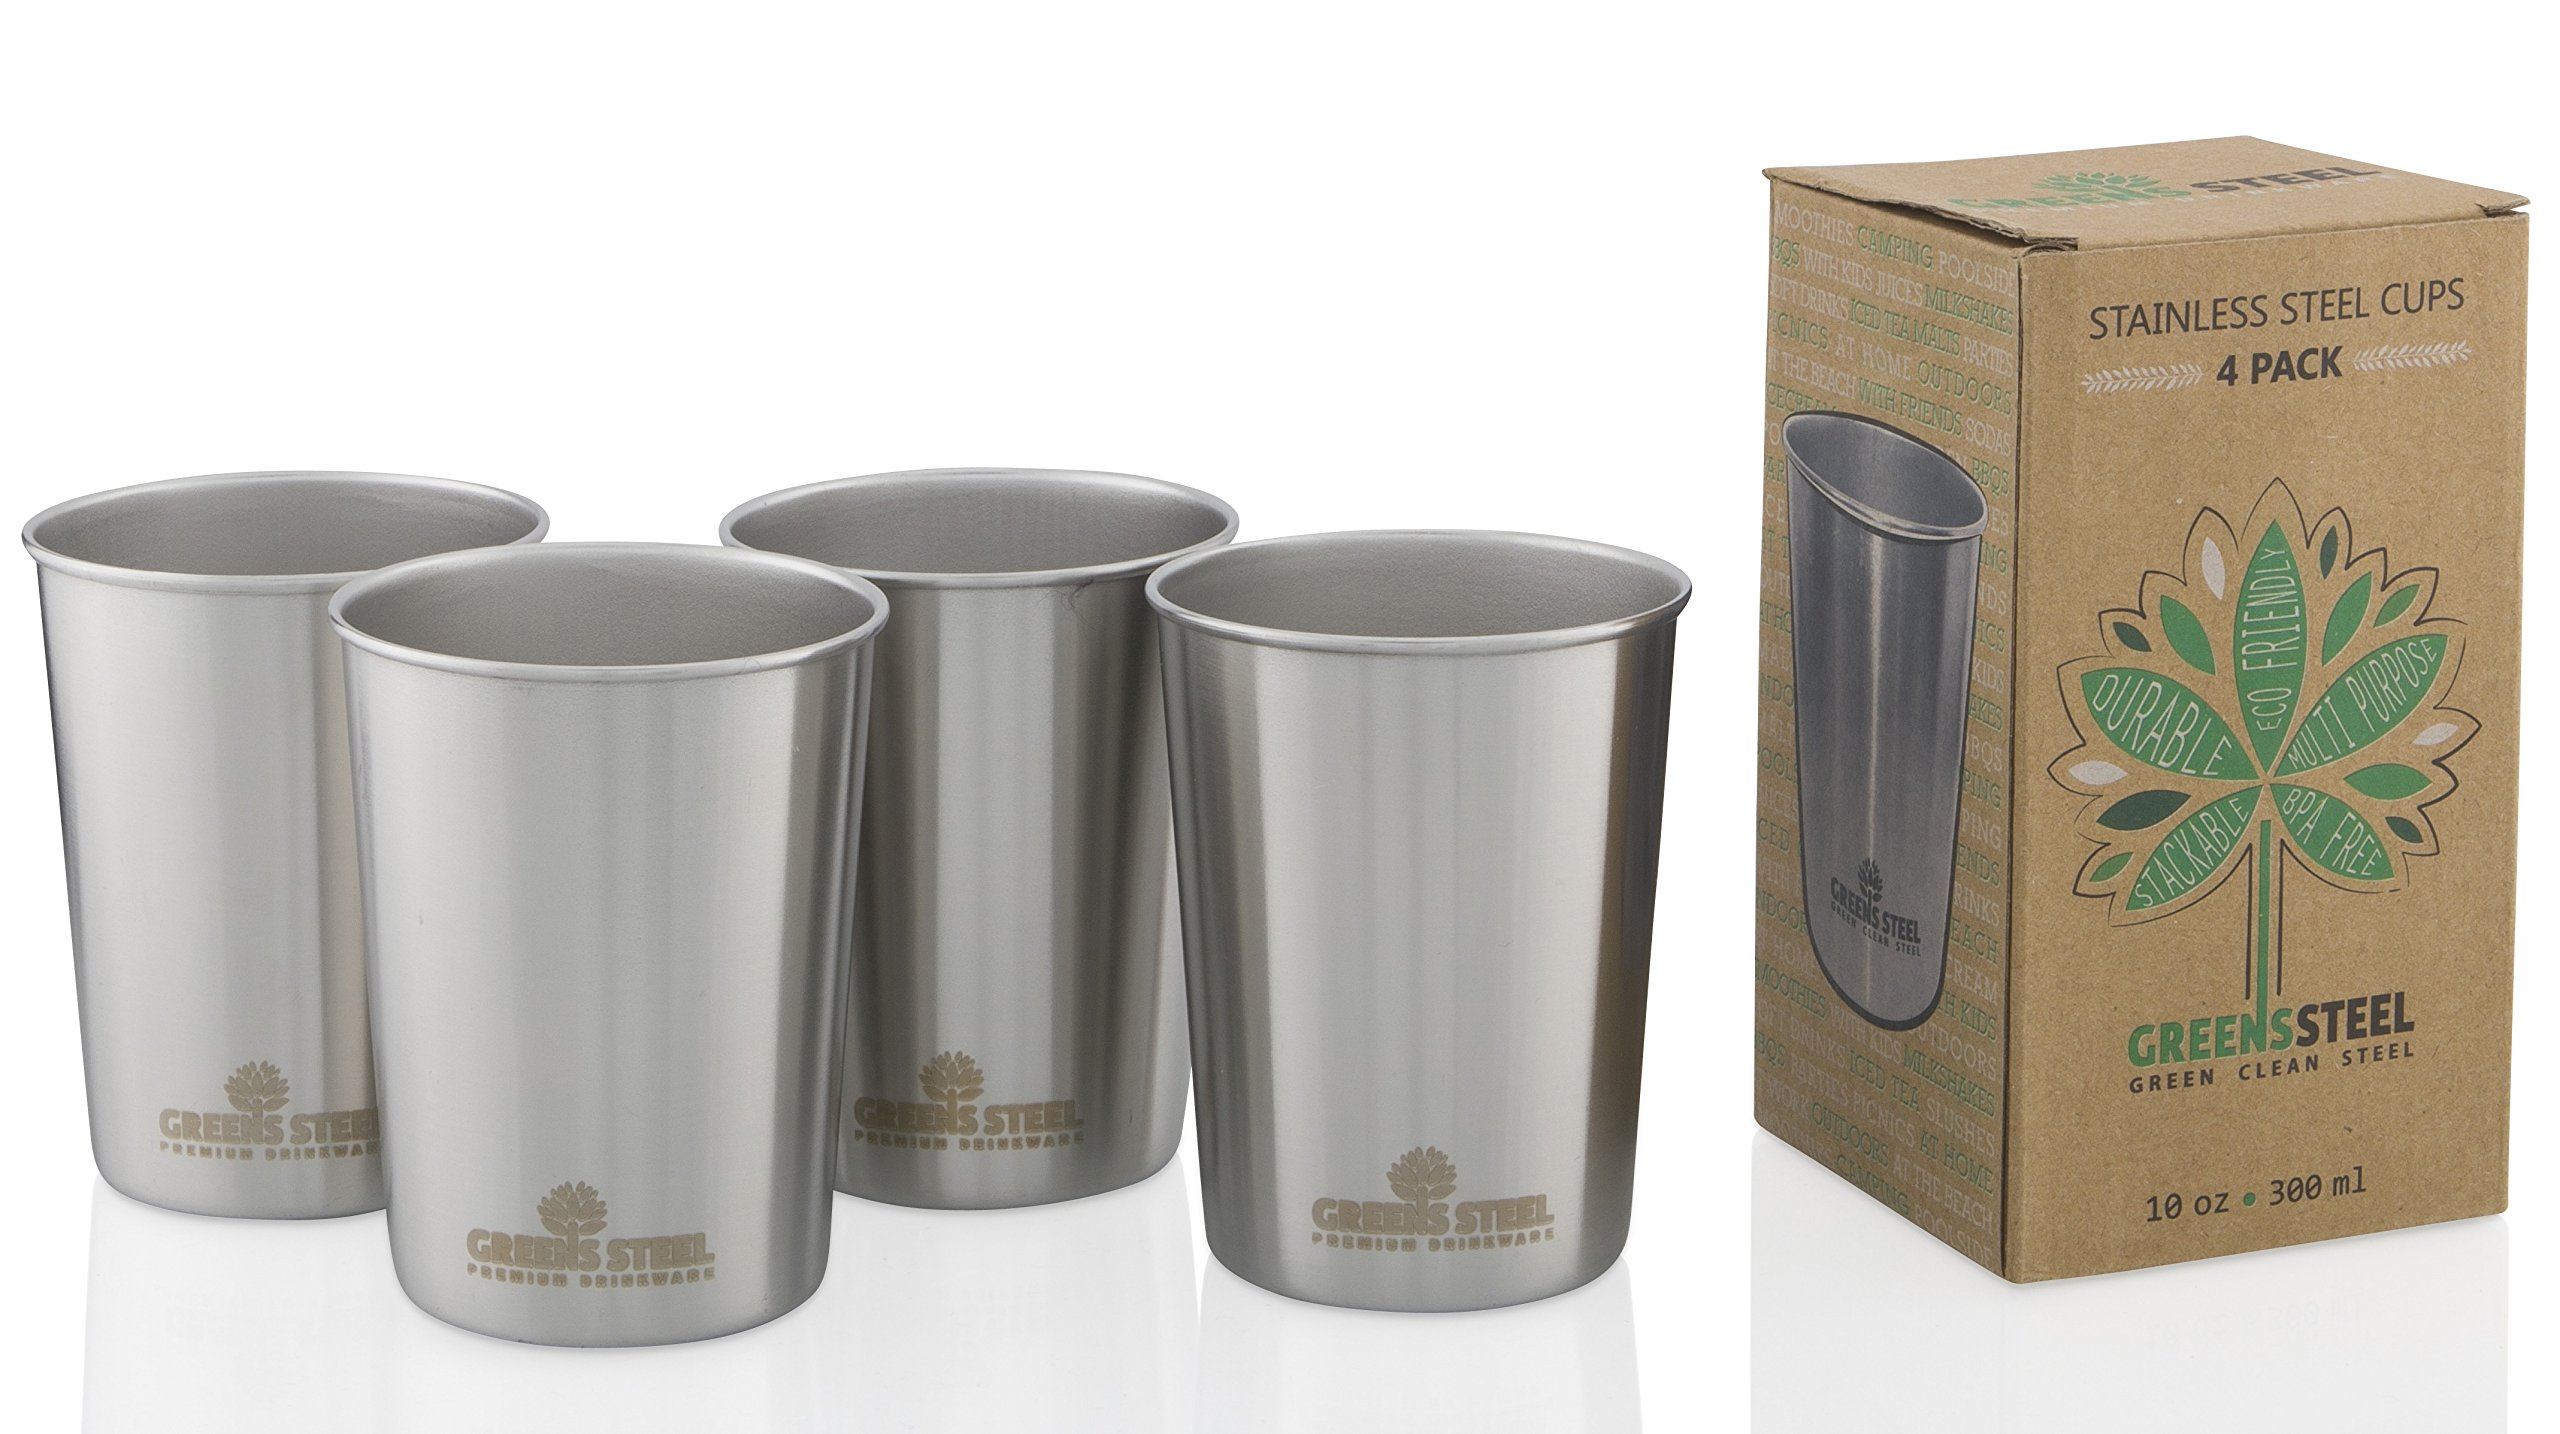 10oz Stainless Steel Cups - Metal Cups For Kids - BPA free (4 Pack) by Greens Steel